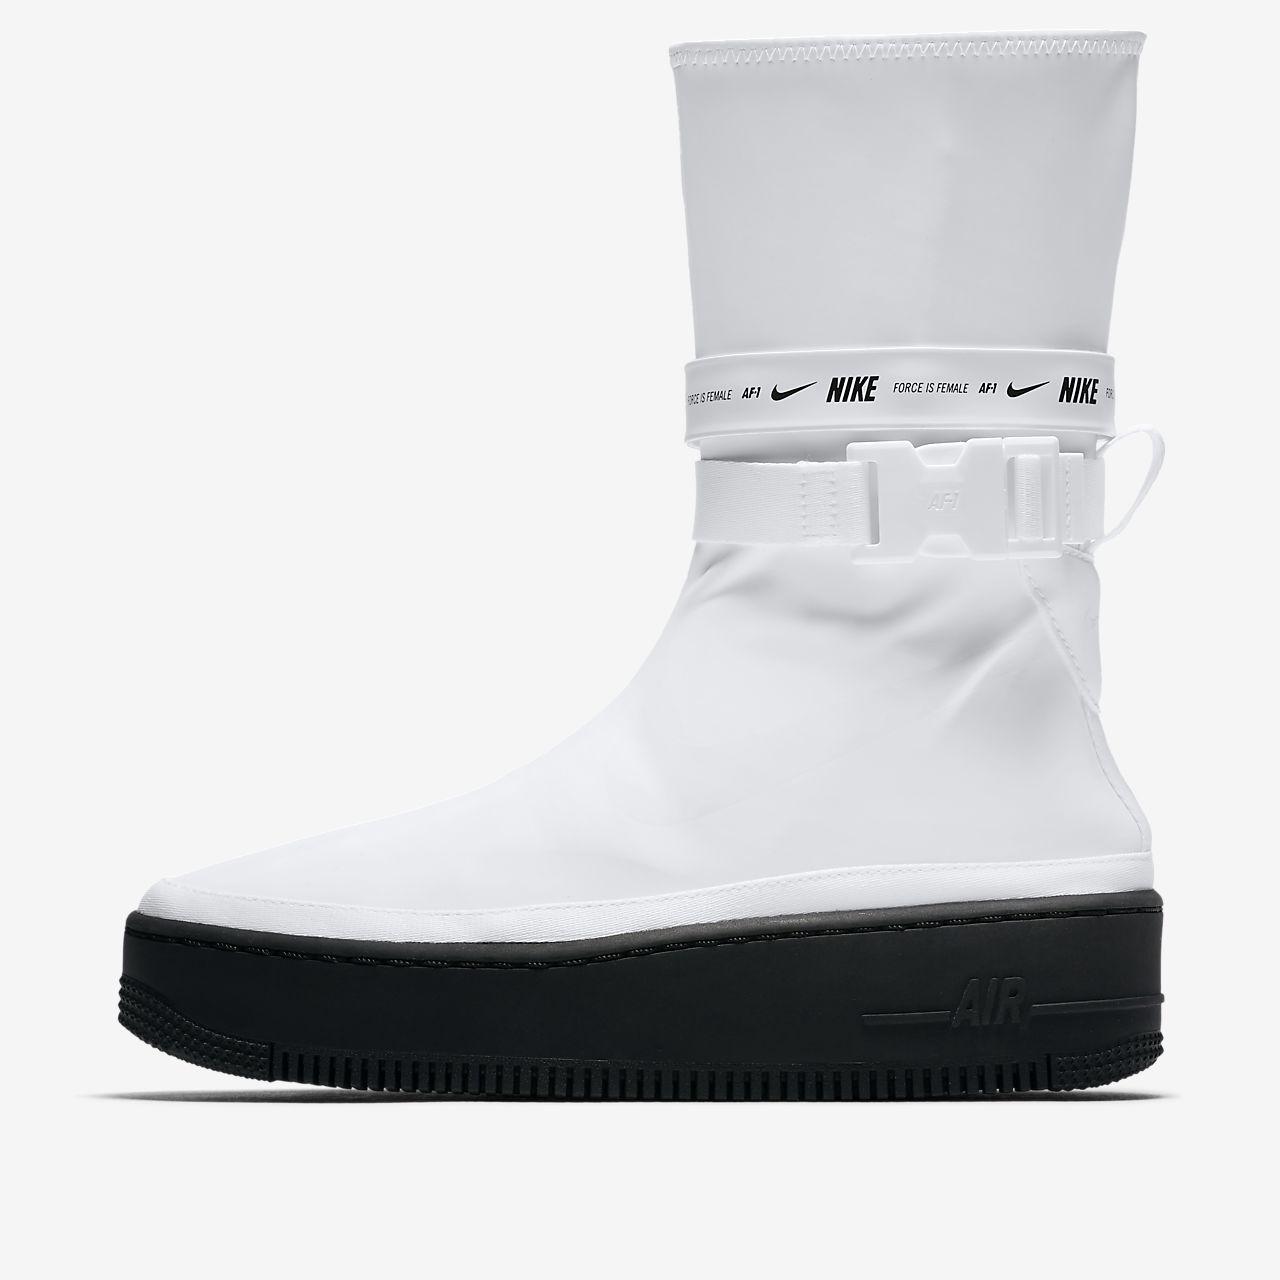 785c7661a57 Dámská bota Nike Air Force 1 Sage High. Nike.com CZ